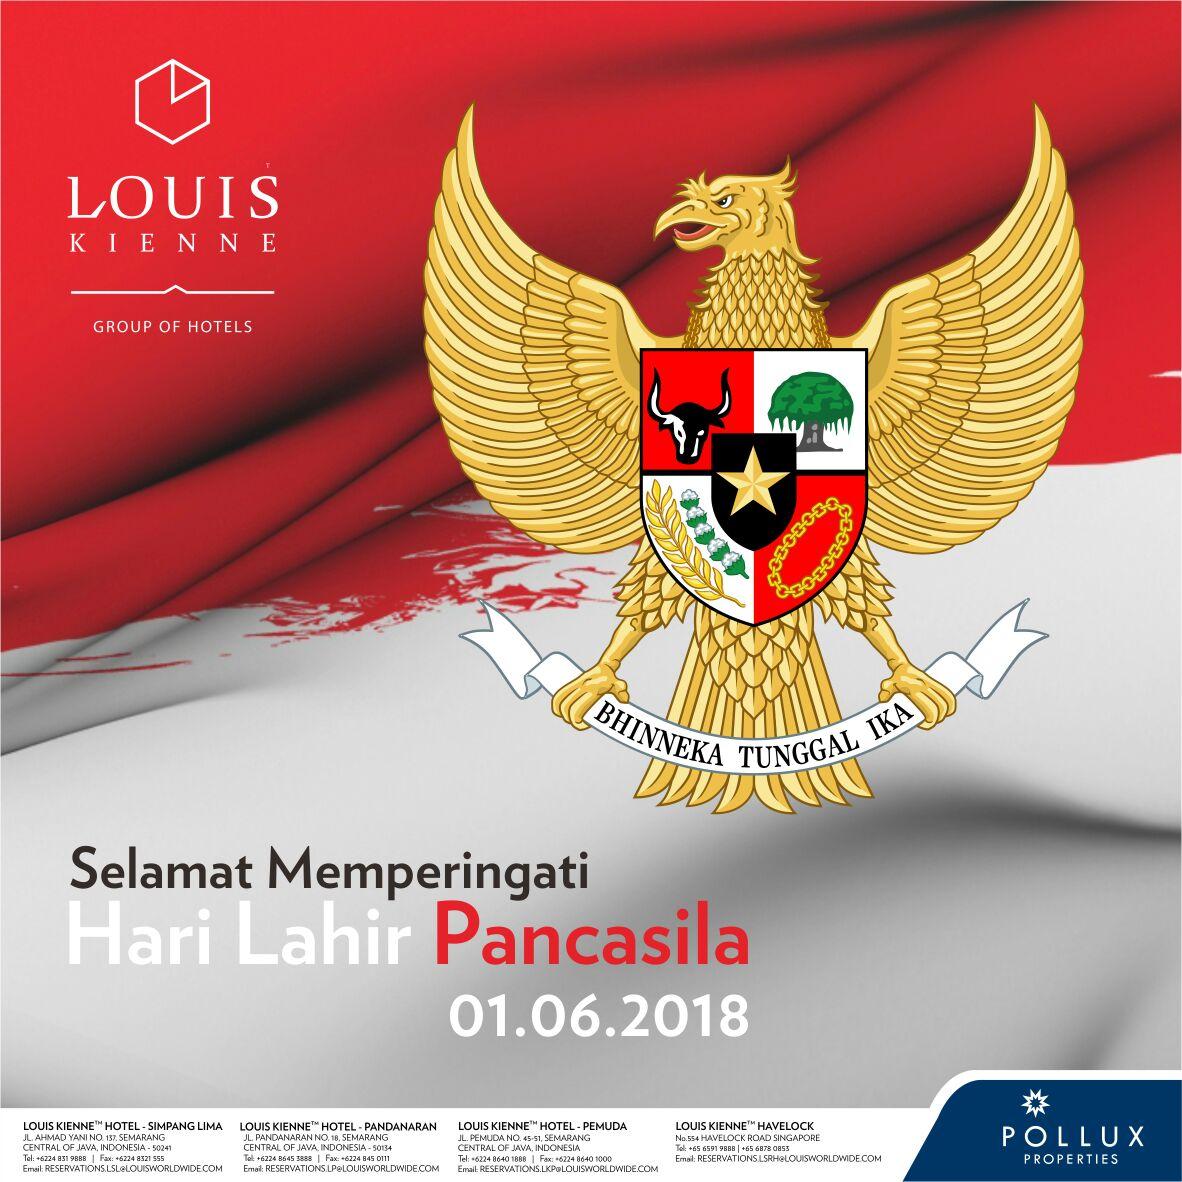 Louiskiennegroupofhotels Hashtag On Twitter Voucher Hotel Louis Kienne Semarang Simpang 5 0 Replies Retweets Likes